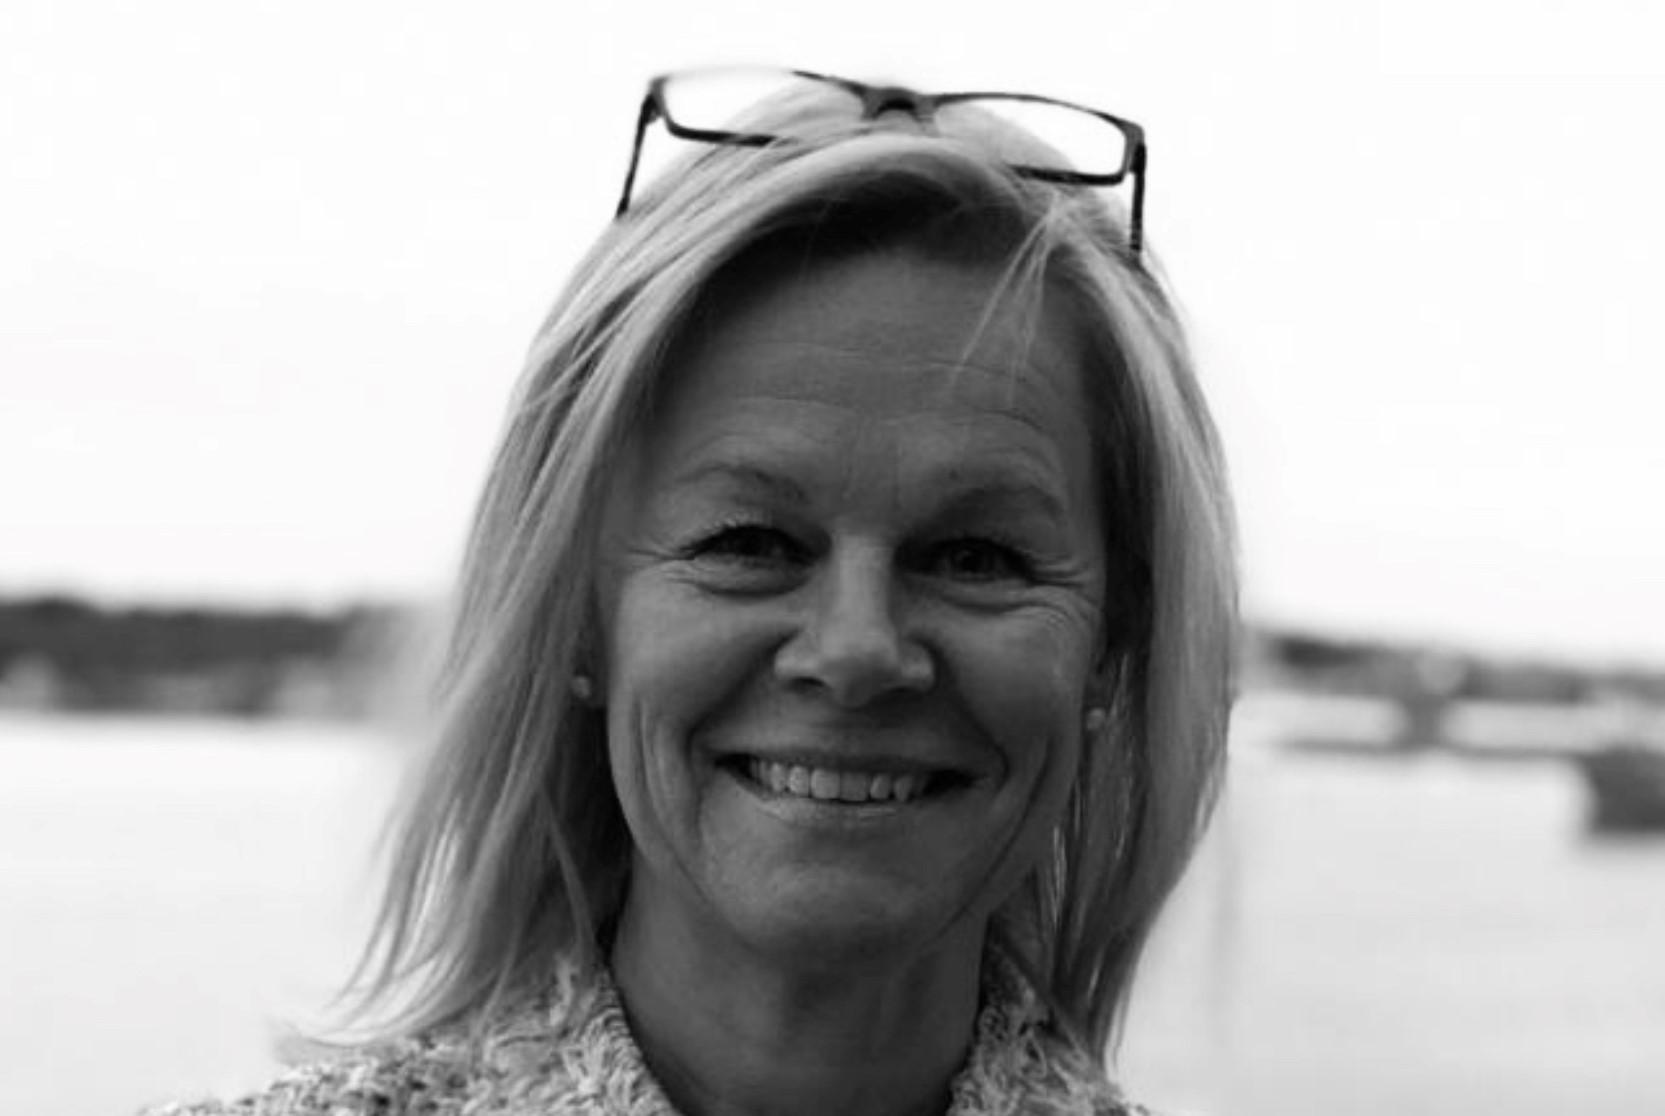 Annika Waller